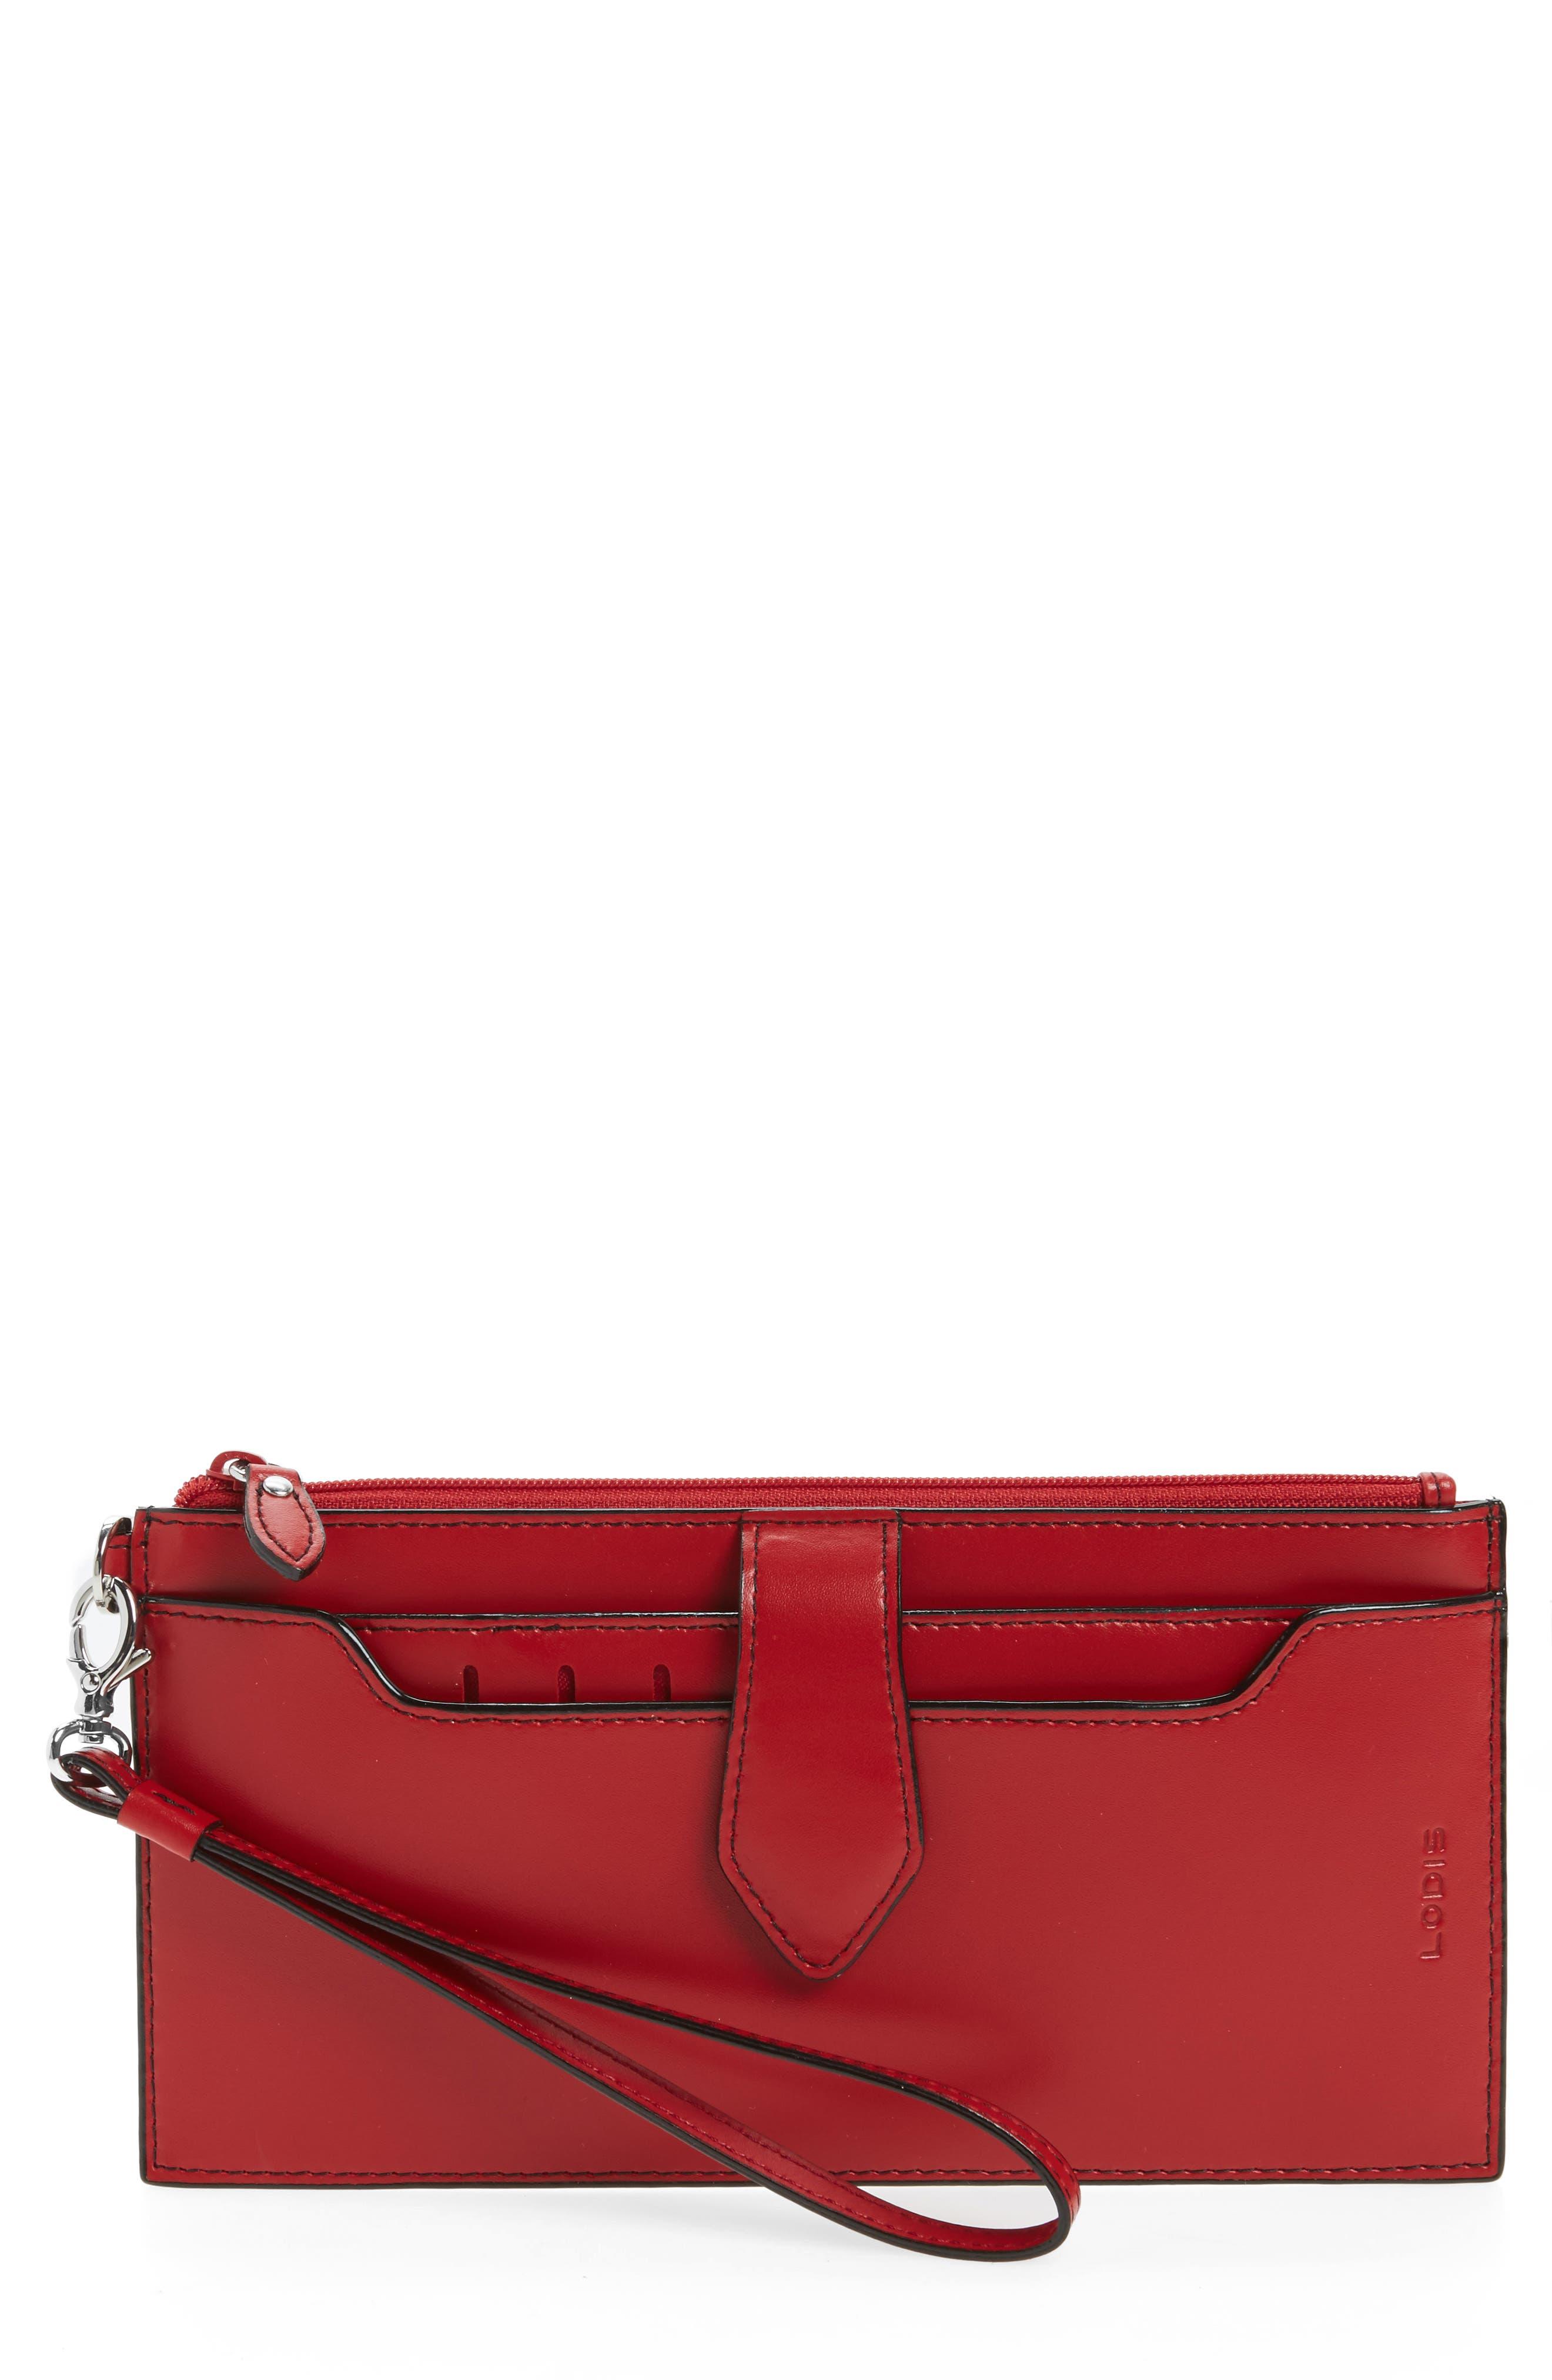 Audrey Under Lock & Key Queenie Wallet,                             Main thumbnail 1, color,                             Red